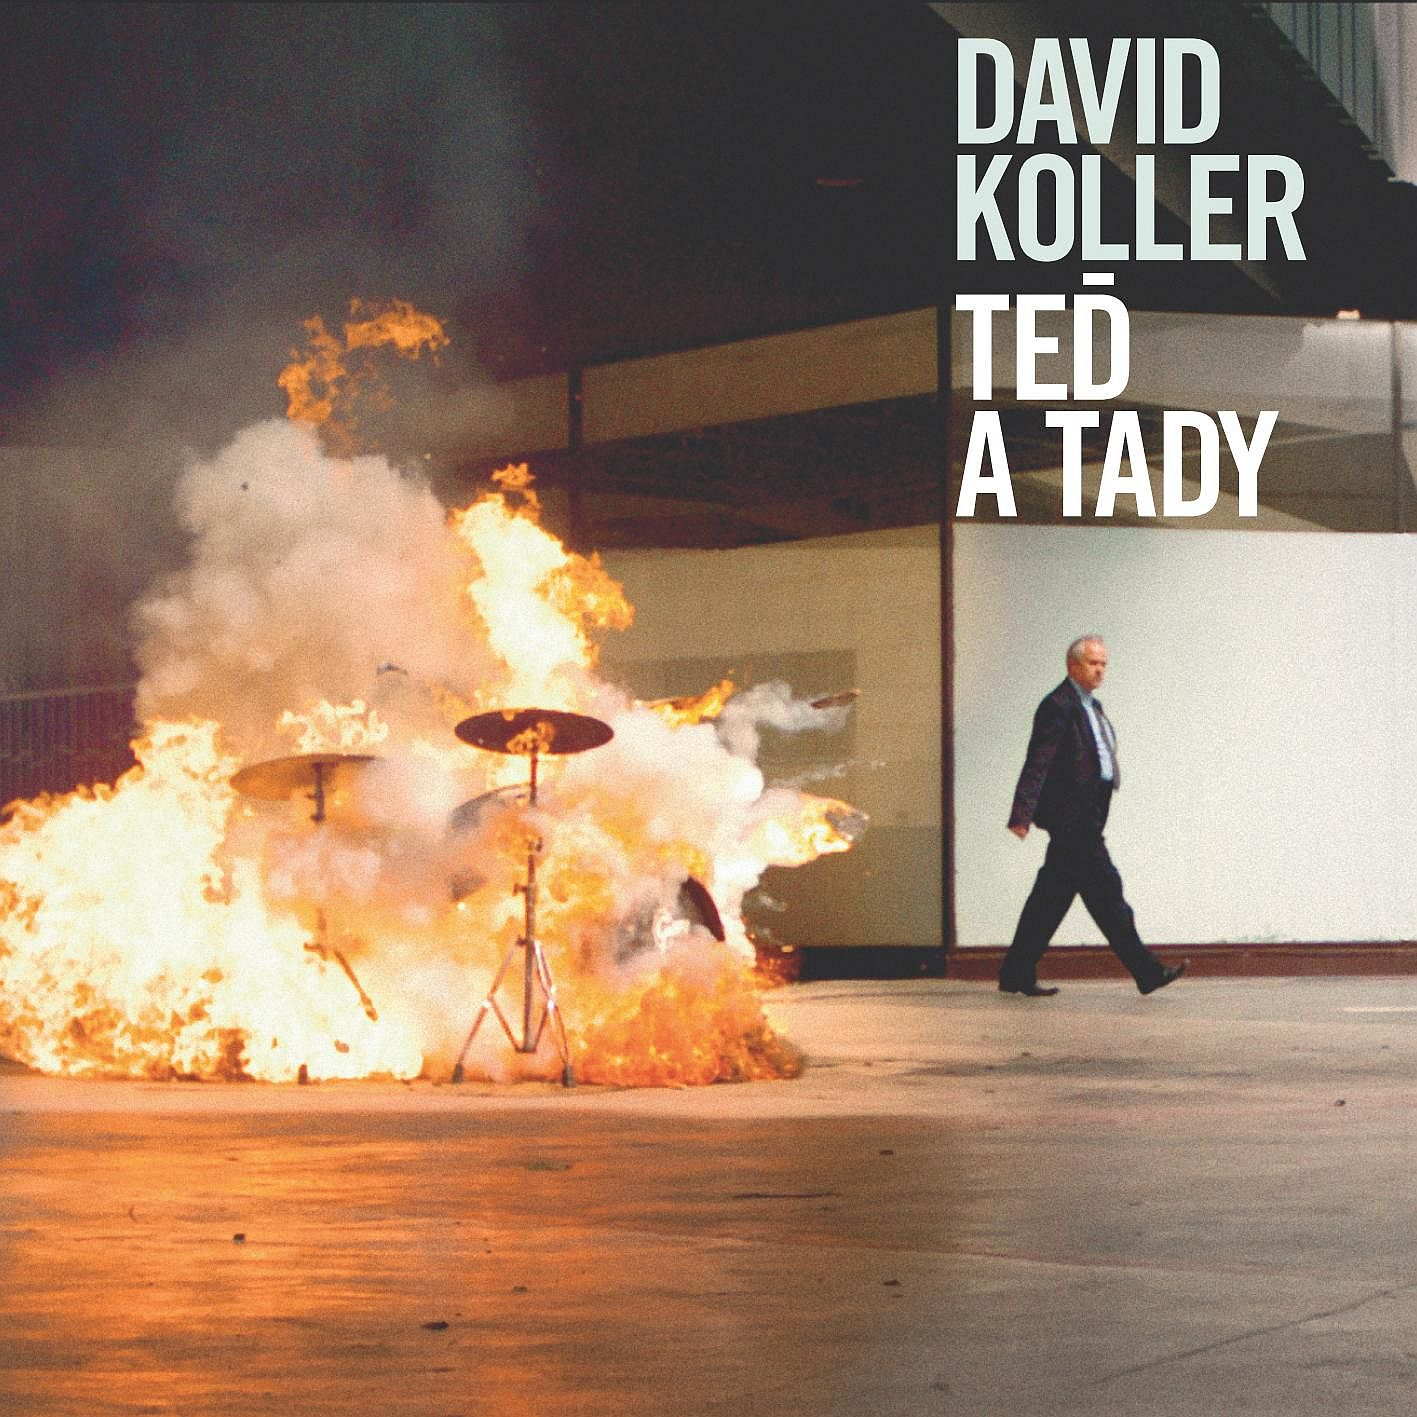 David Koller podepisoval CD Teď a tady